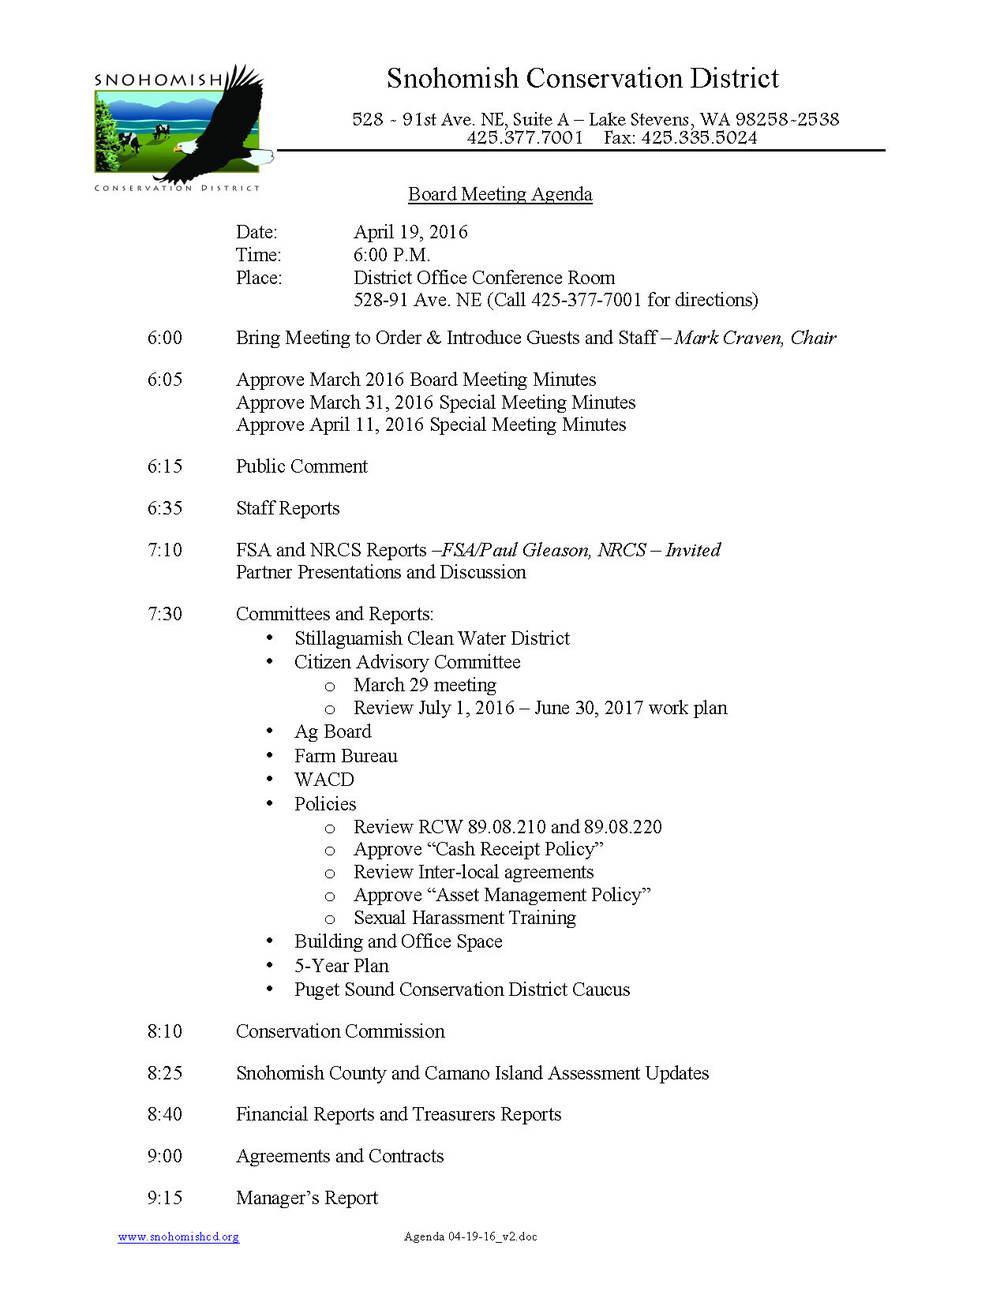 Agenda 04-19-16_v2_Page_1.jpg